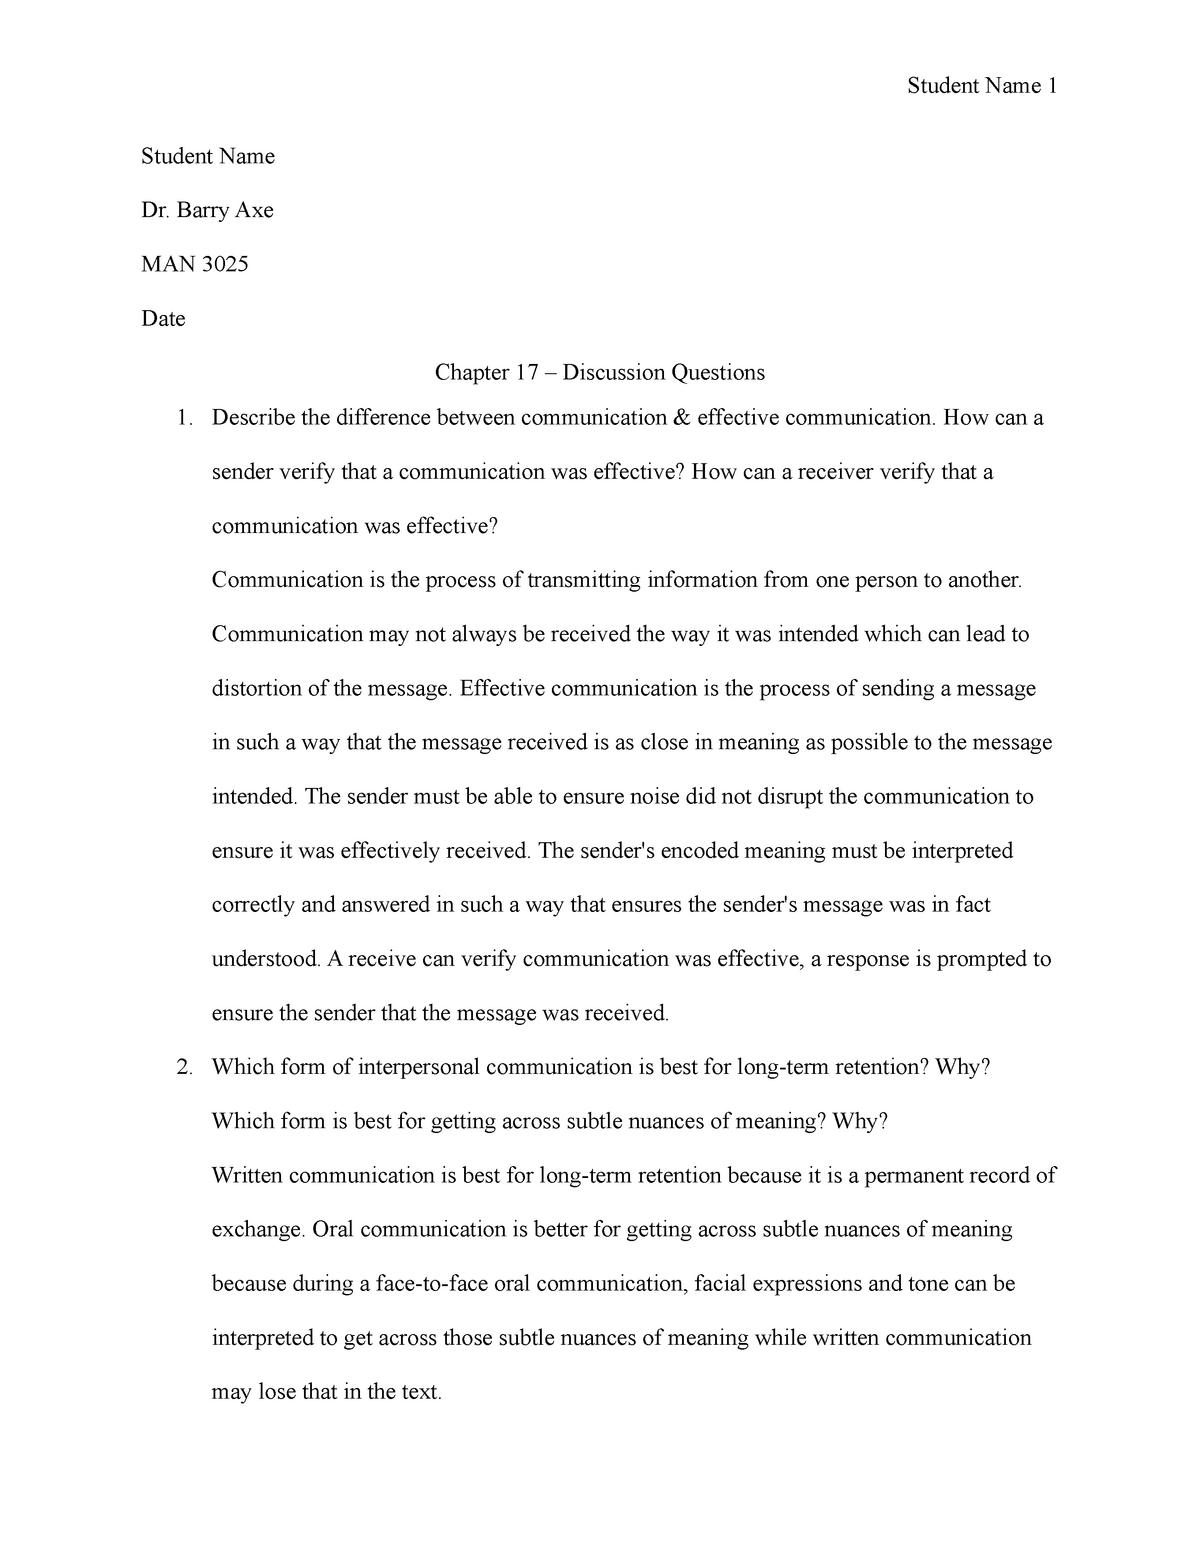 Discussion Questions Ch 17 - MAN 3025 - FAU - StuDocu